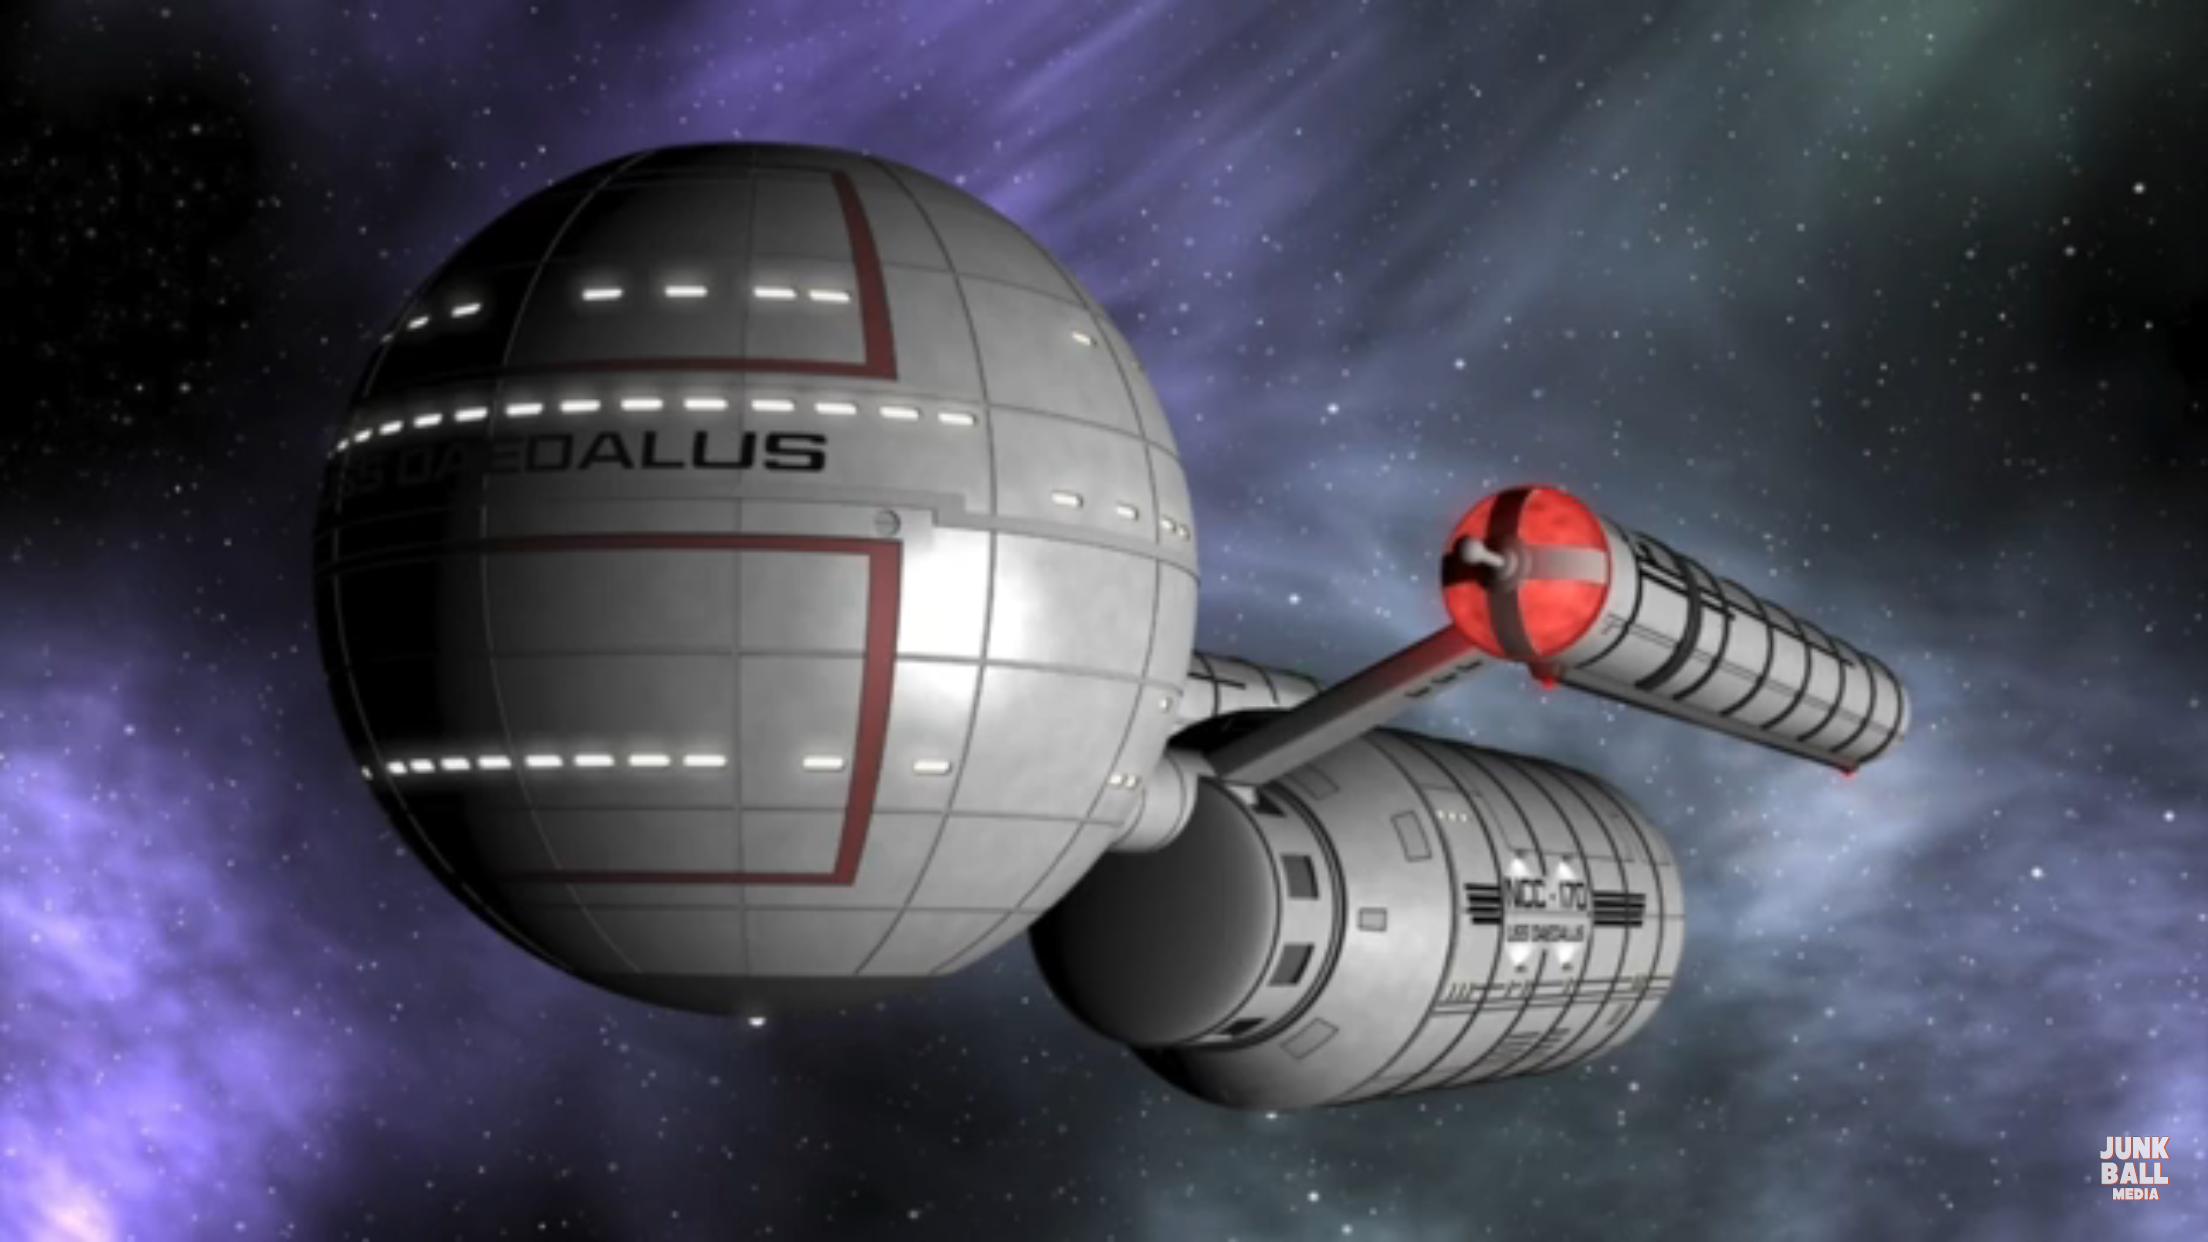 Uss enterprise ncc 1701 d galaxy class saucer separation r flickr - Battle Damaged Model Of U S S Enterprise Ncc 1701 C From St Tng Episode Yesterday S Enterprise Star Trek U S S Enterprise Ncc 1701 C Pinterest